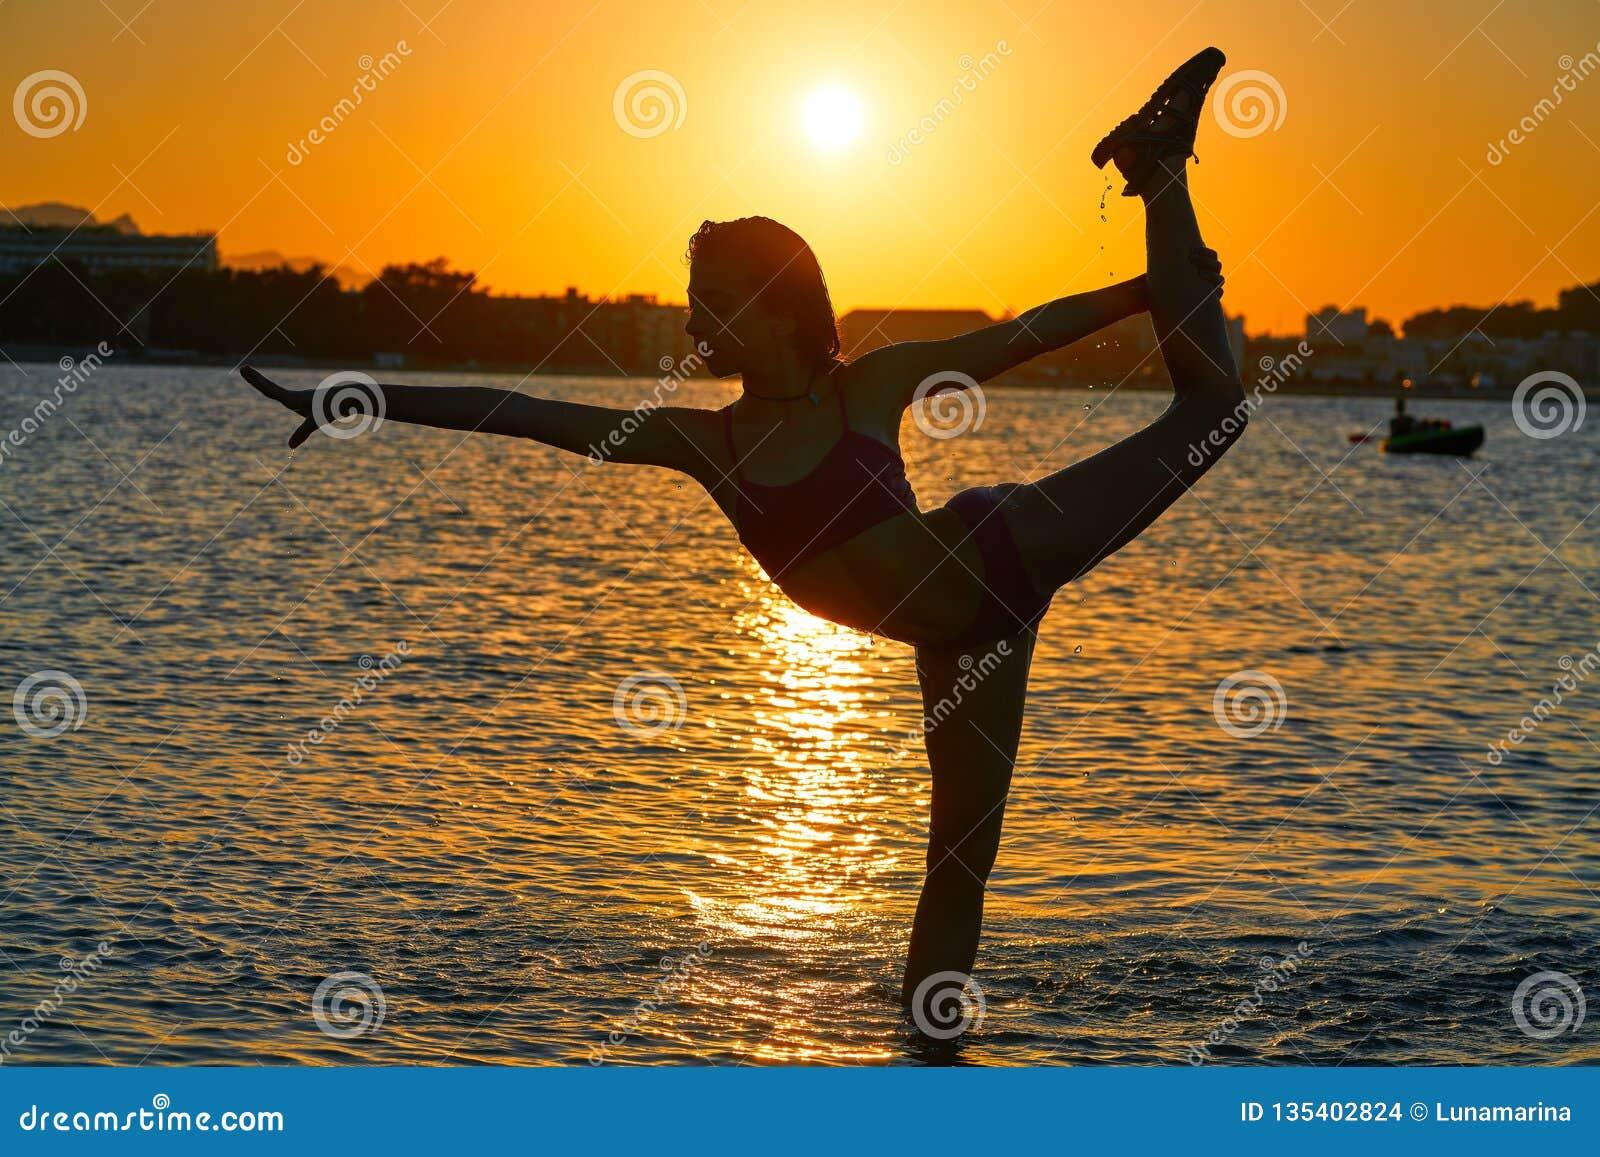 Girl gymnastics pose at sunset beach